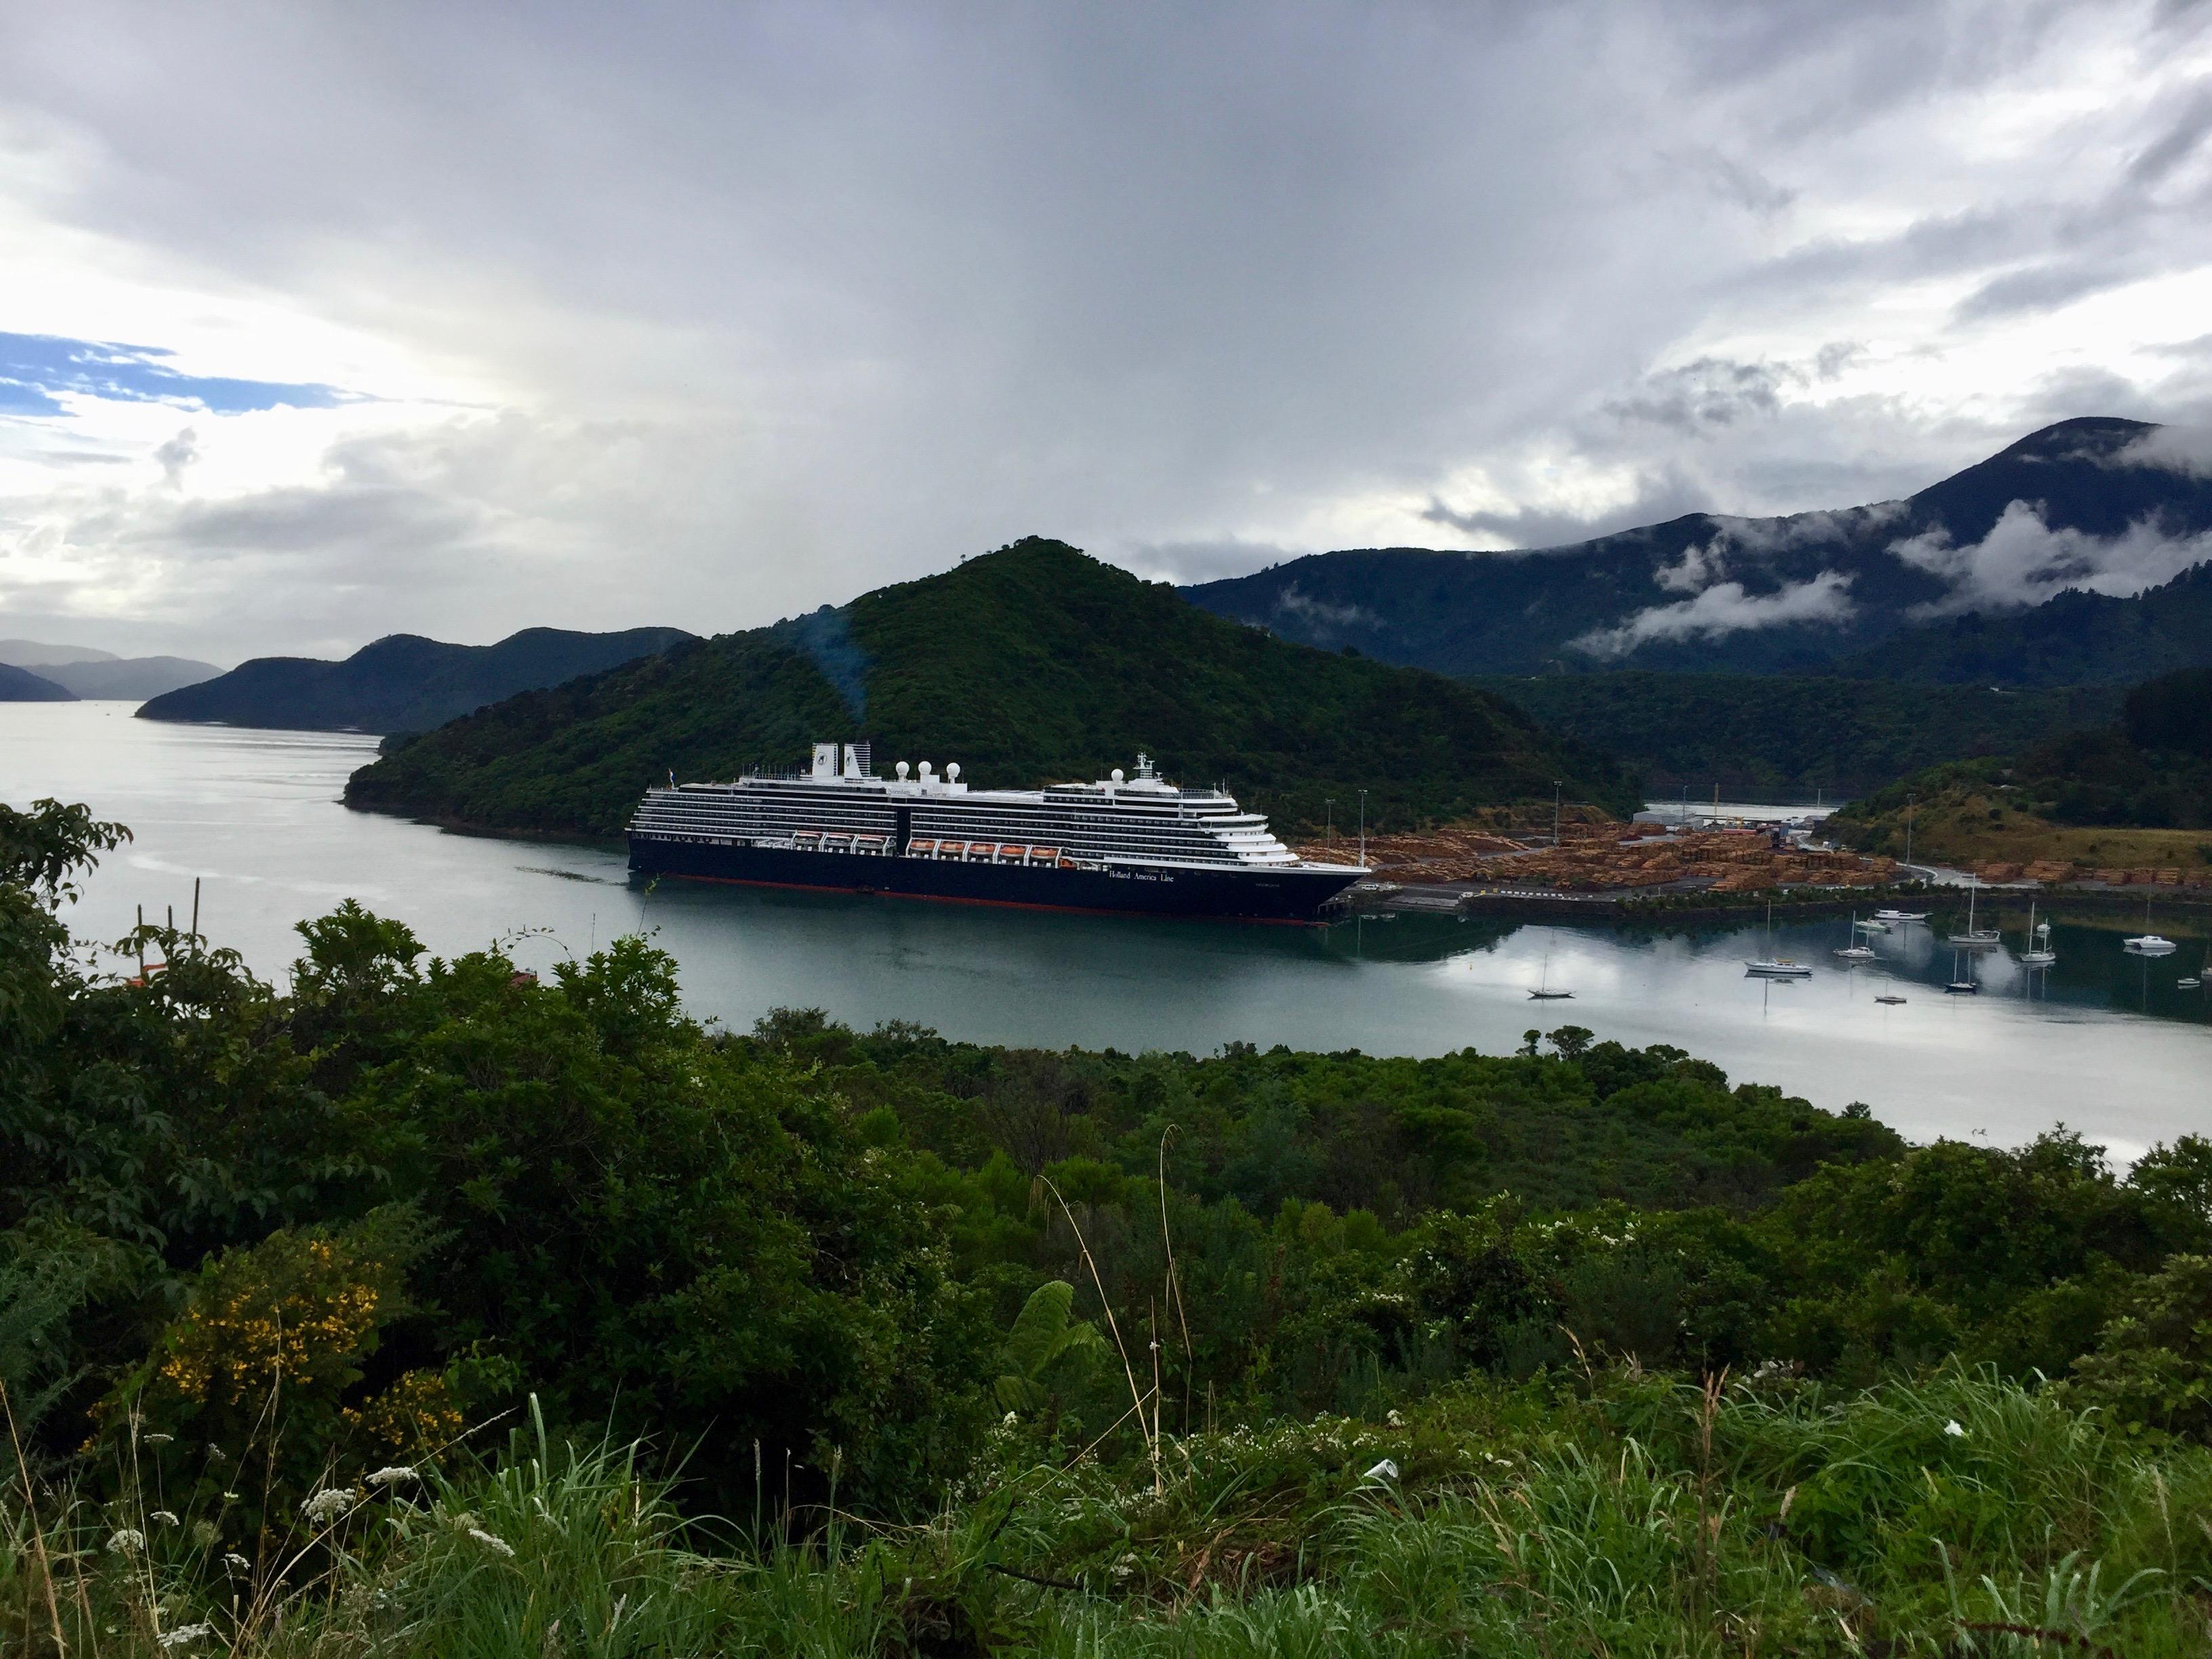 Cruise ship and lumber yard